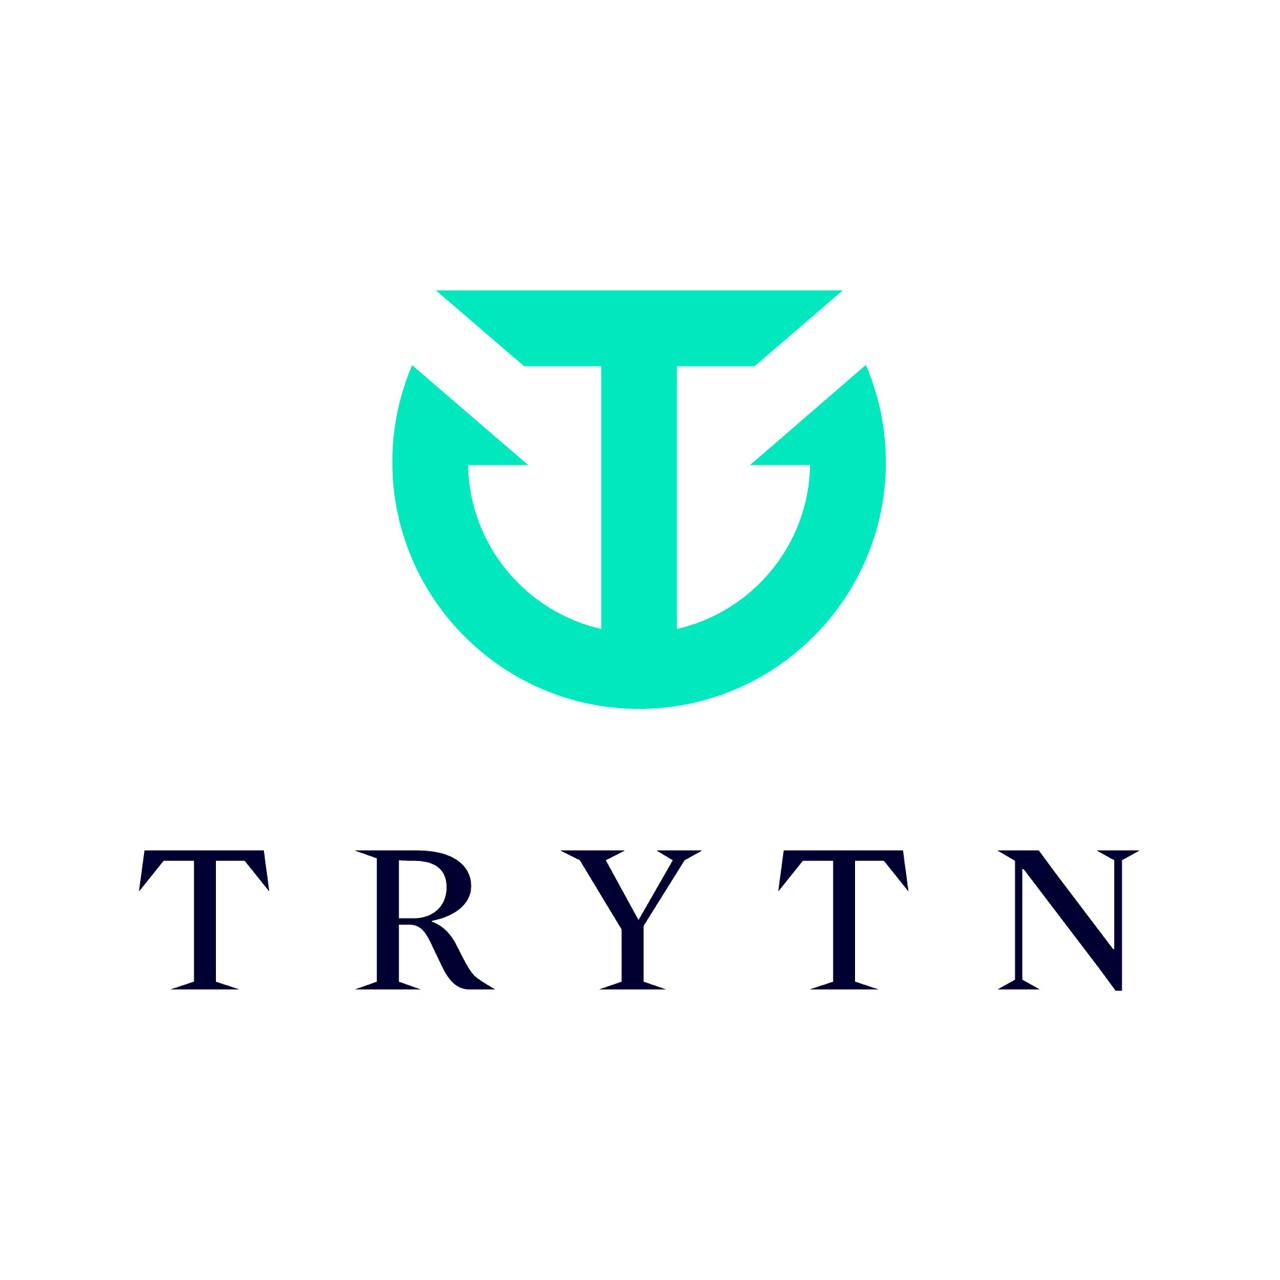 TRYTN logo